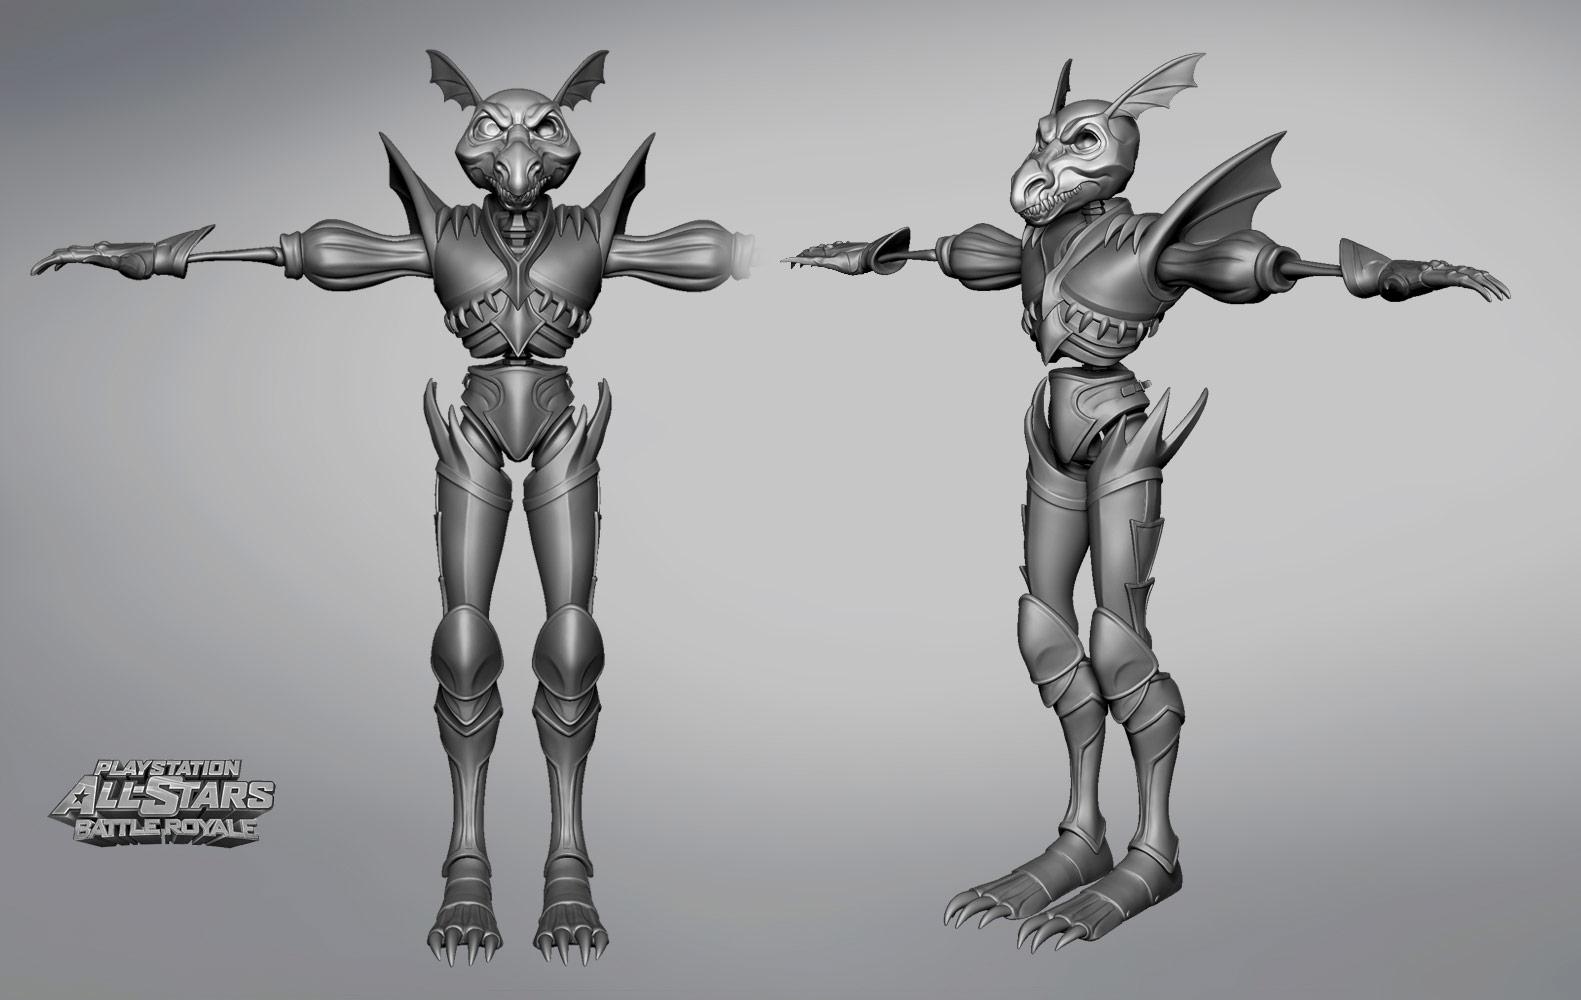 Sir Daniel's Dragon Armor in PlayStation All-Stars Battle Royale image #2